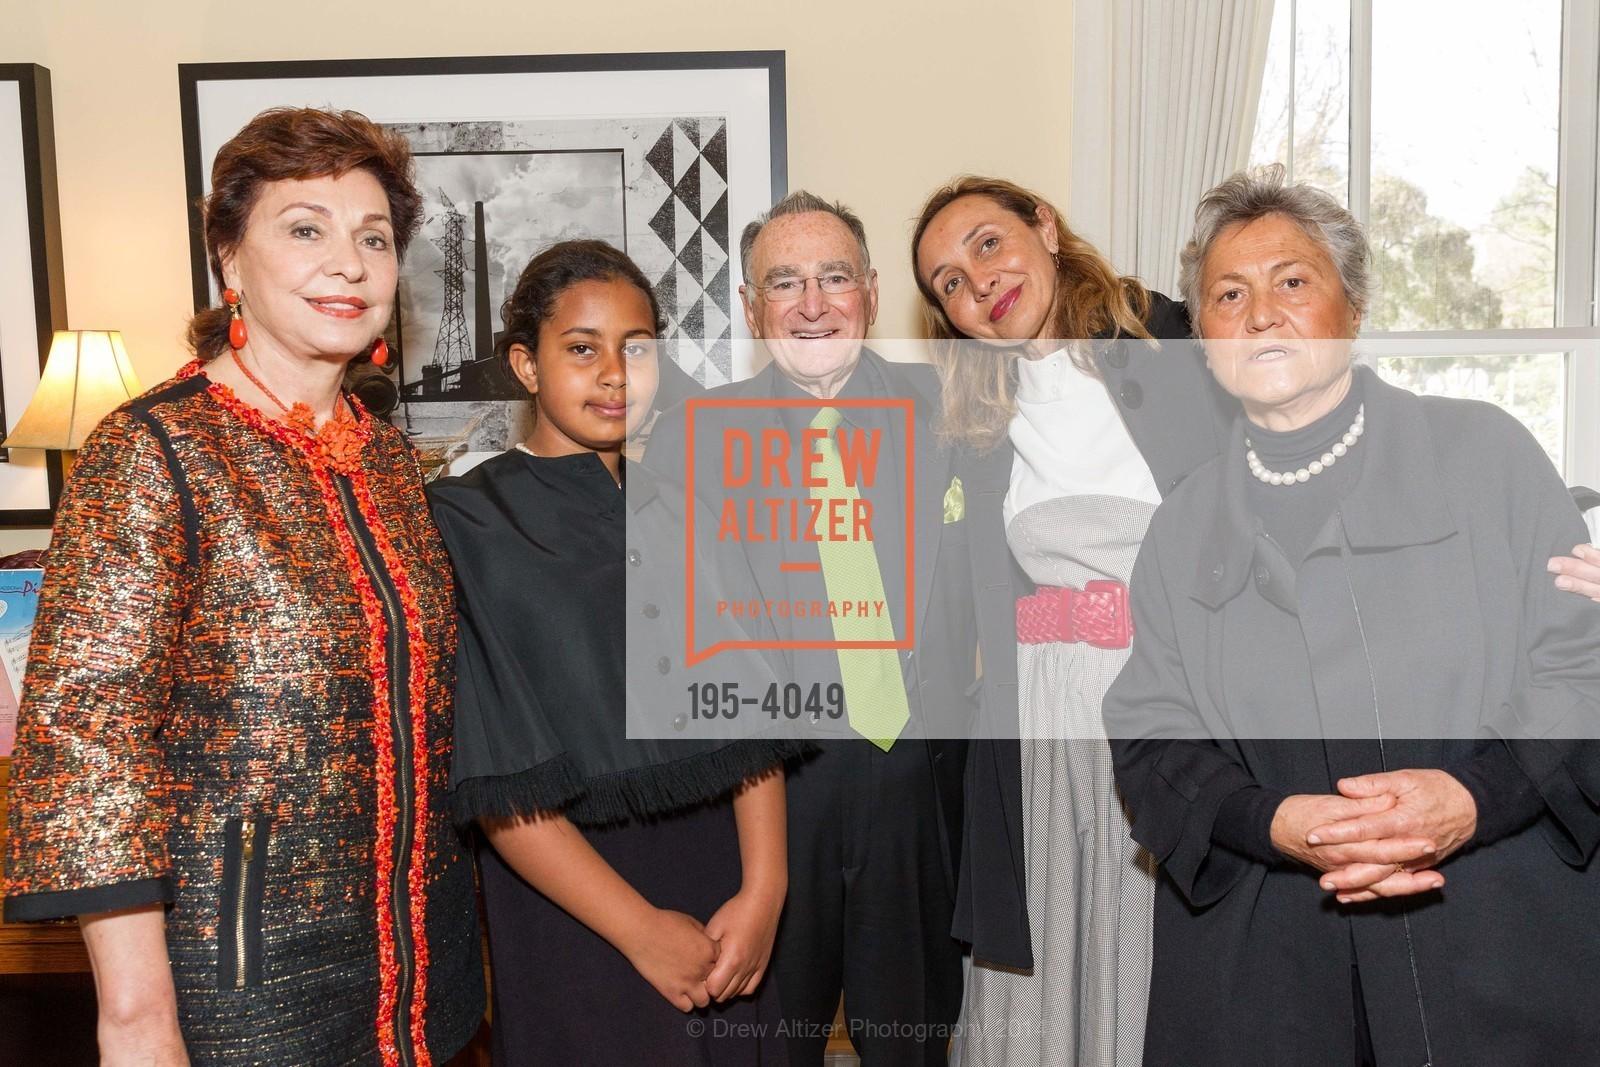 Maria Manetti Shrem, Camilla Ruini, Jan Shrem, Beatrice Ruini, Corina Manetti, Photo #195-4049